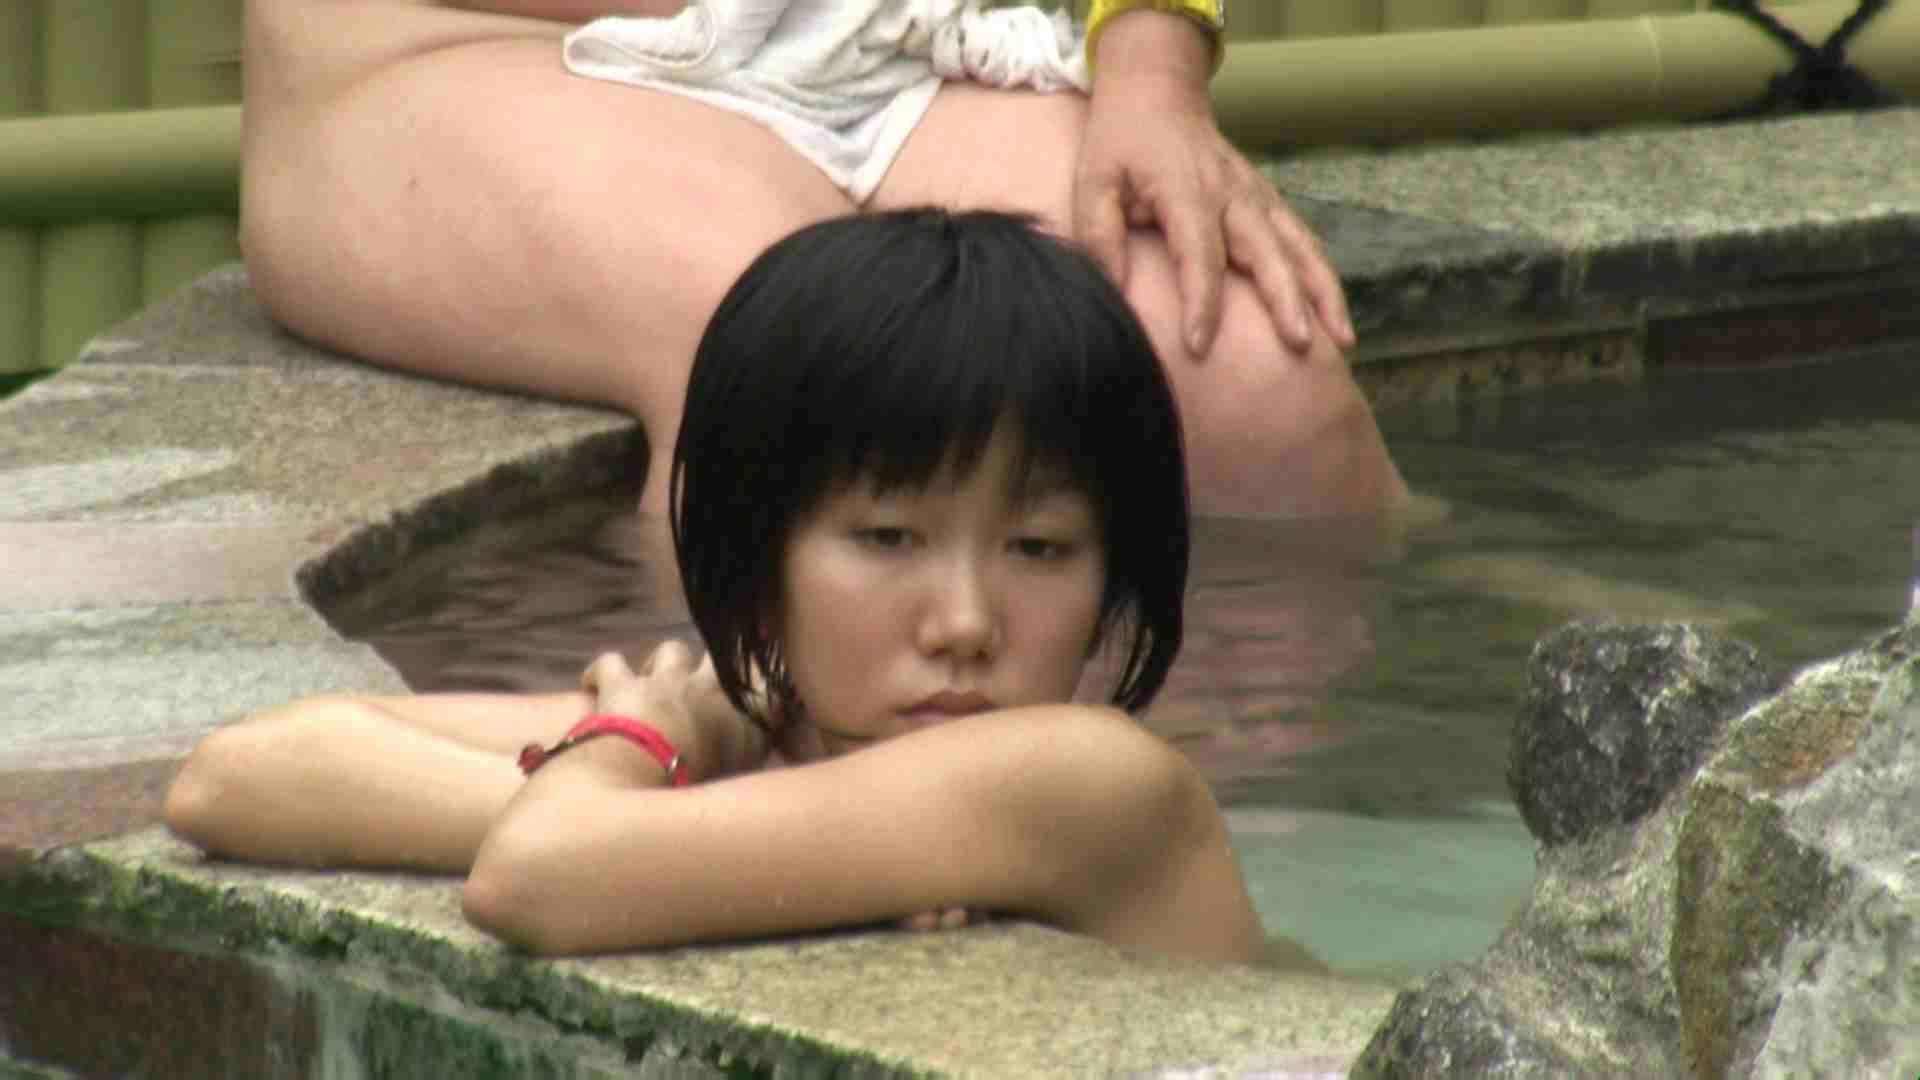 Aquaな露天風呂Vol.37【VIP】 盗撮 濡れ場動画紹介 97PICs 35